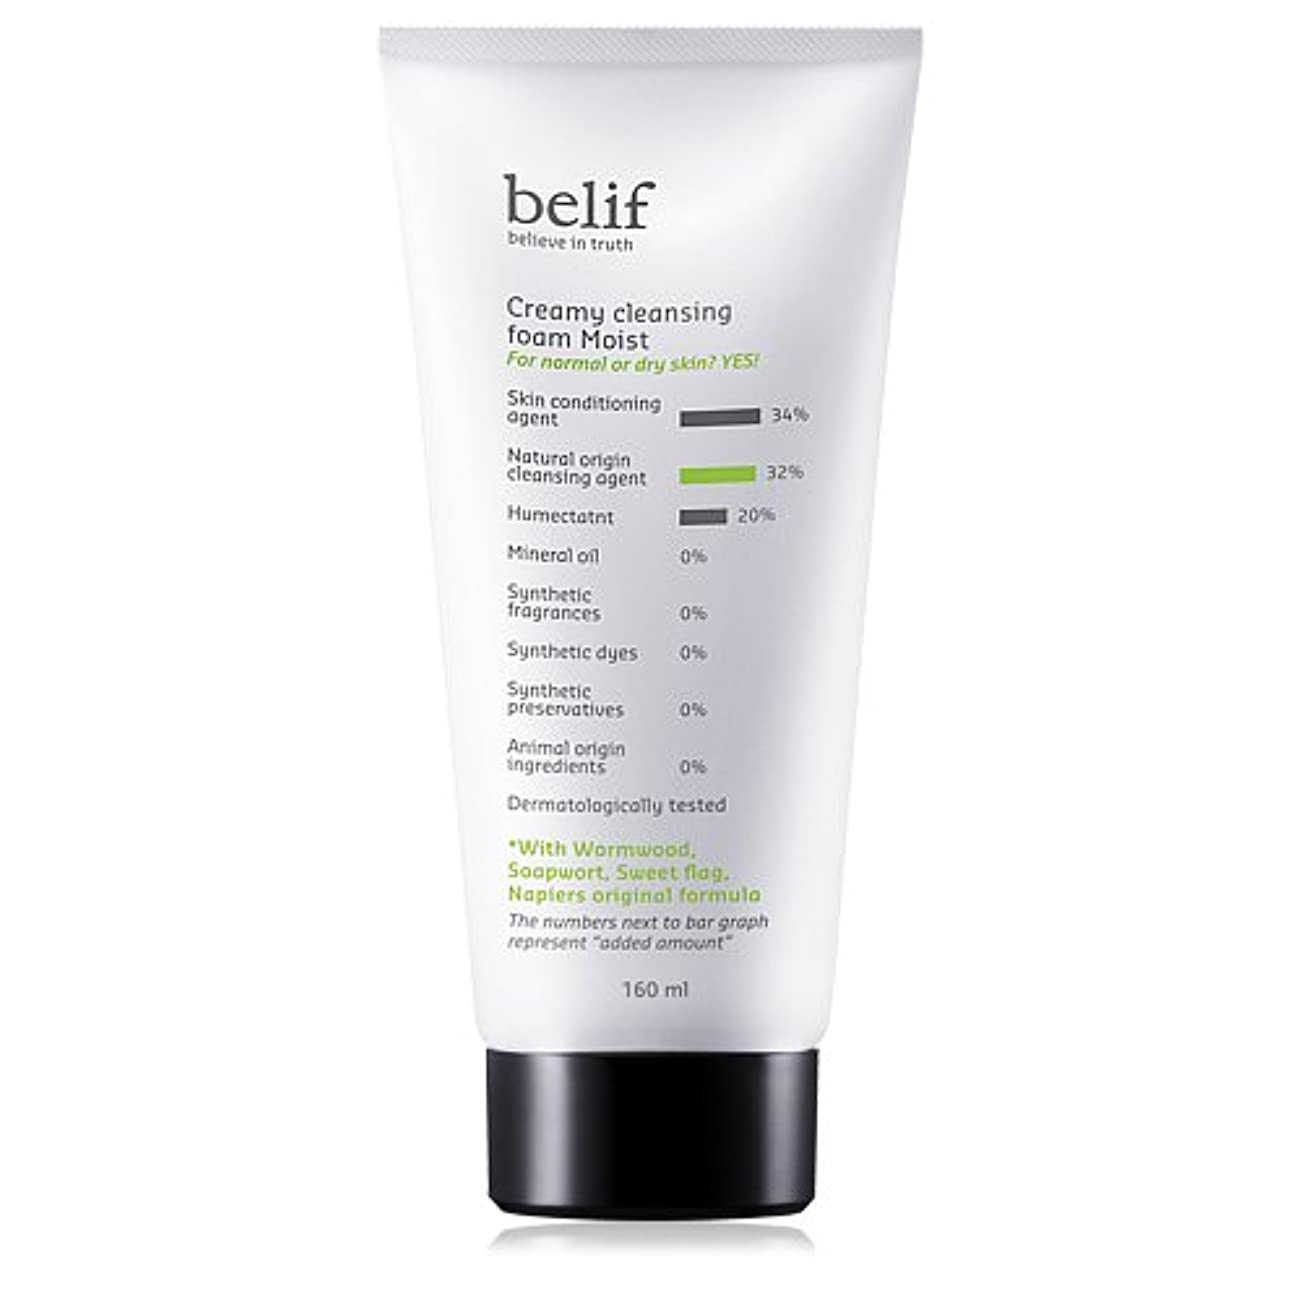 Belif(ビリーフ)Creamy cleansing foam moist 160ml[ビリーフクリーミークレンジングフォームモイスト]